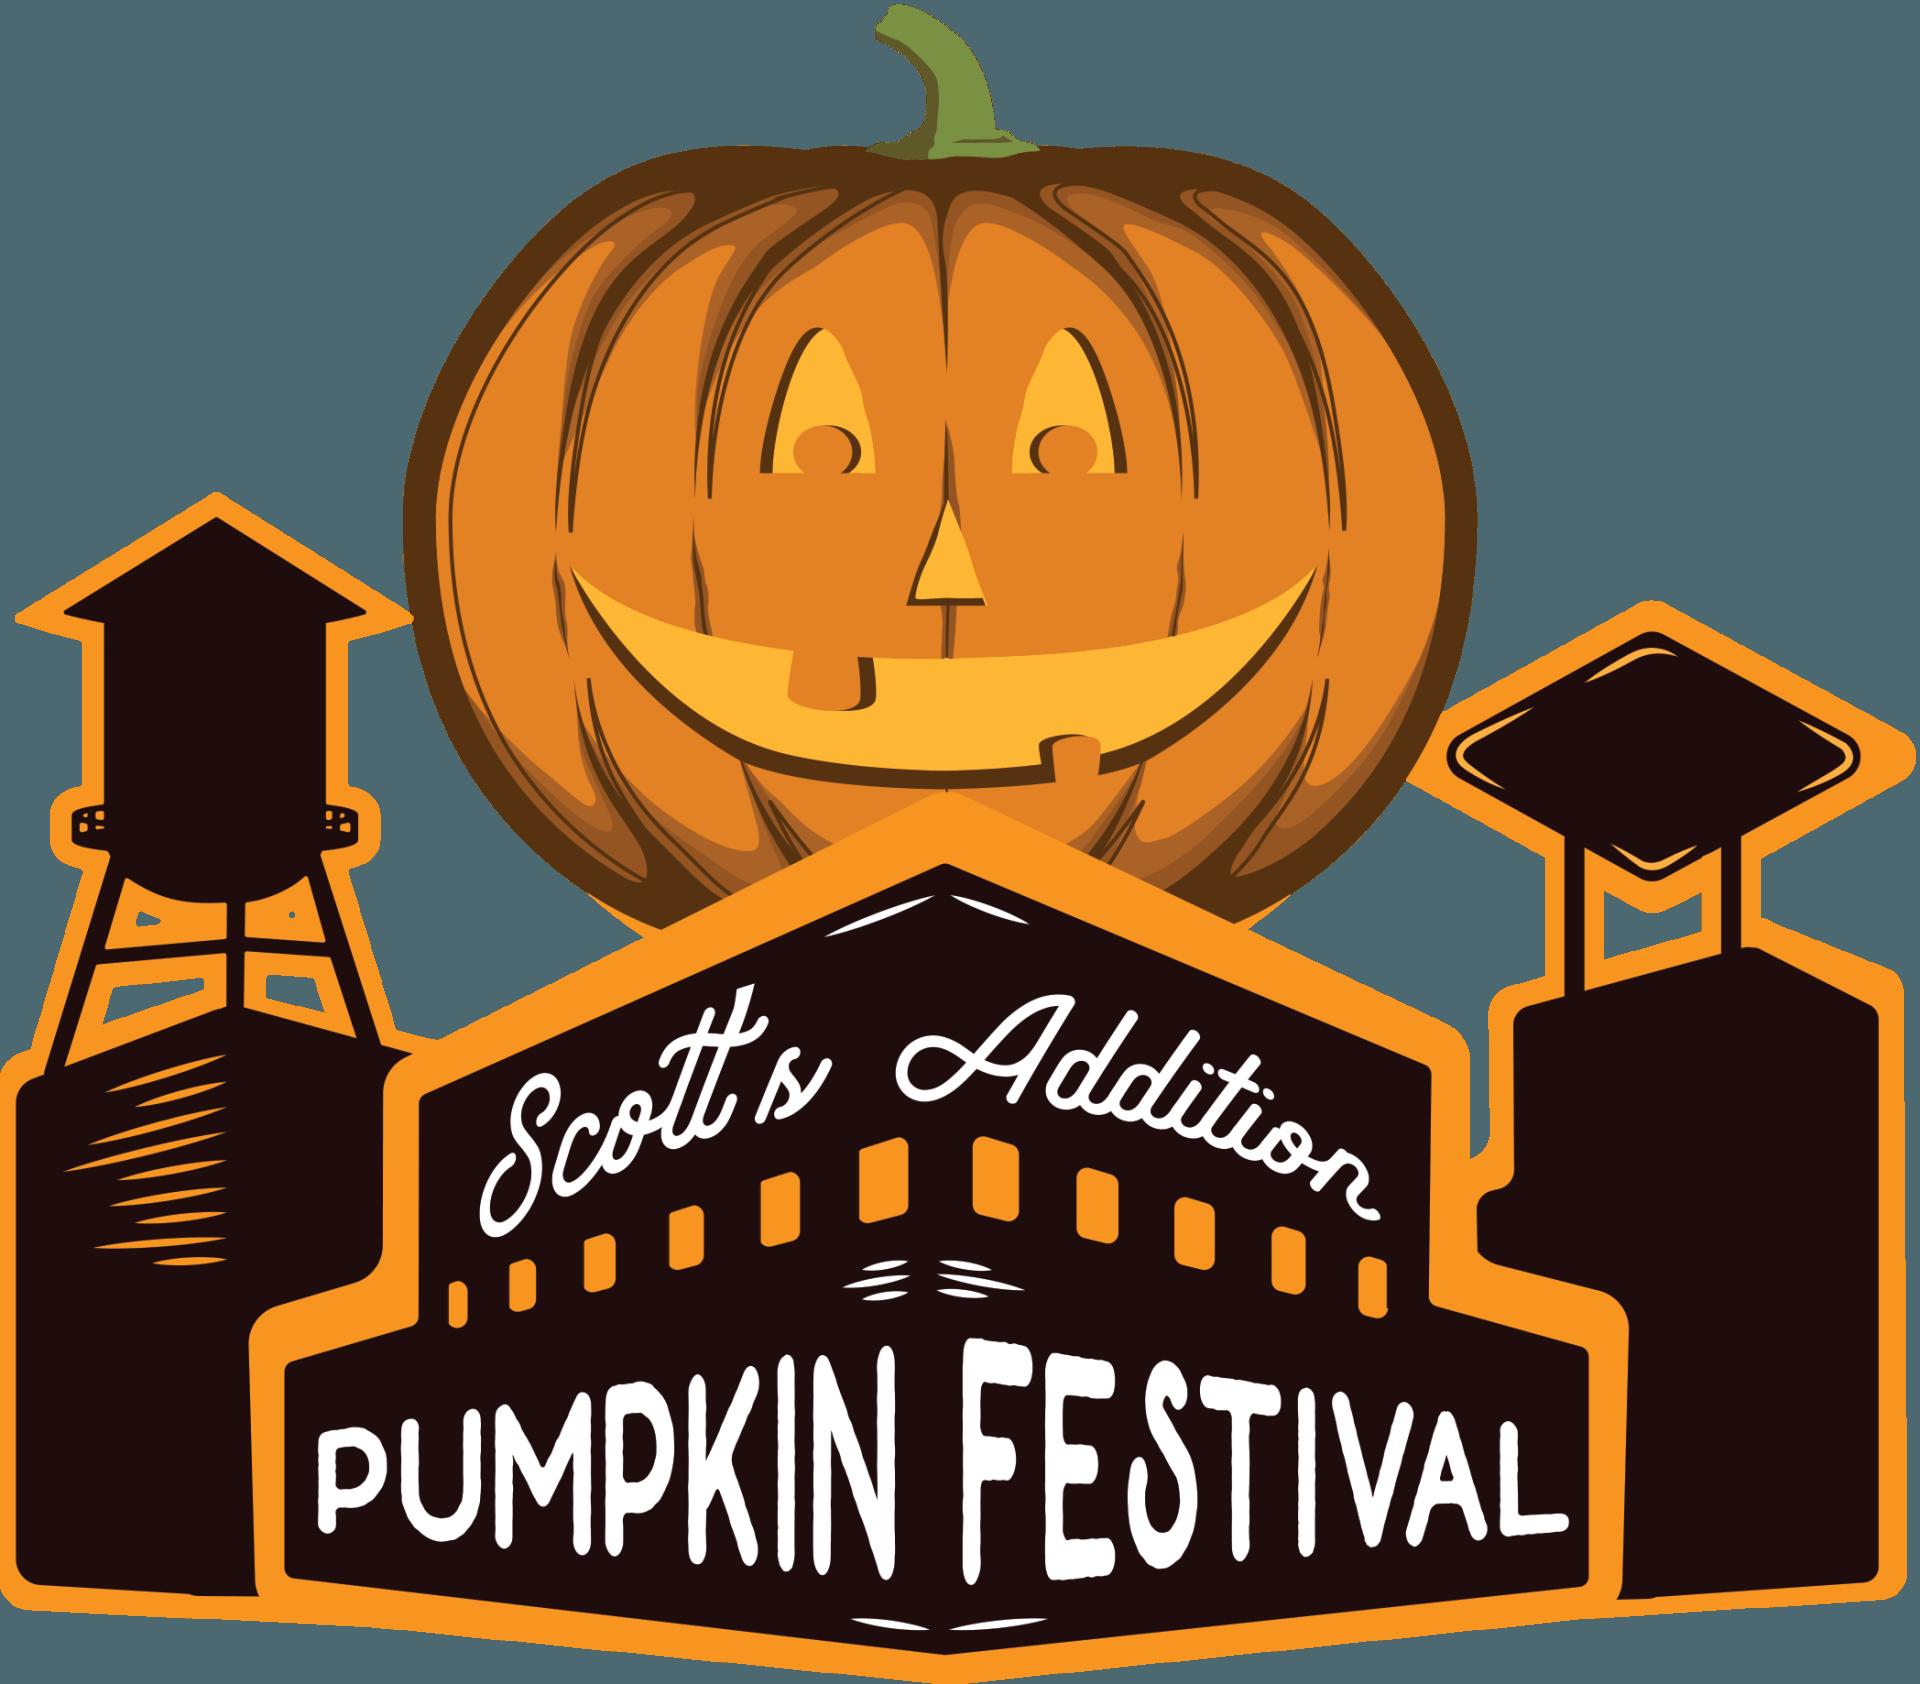 2021 Scott's Addition Pumpkin Festival